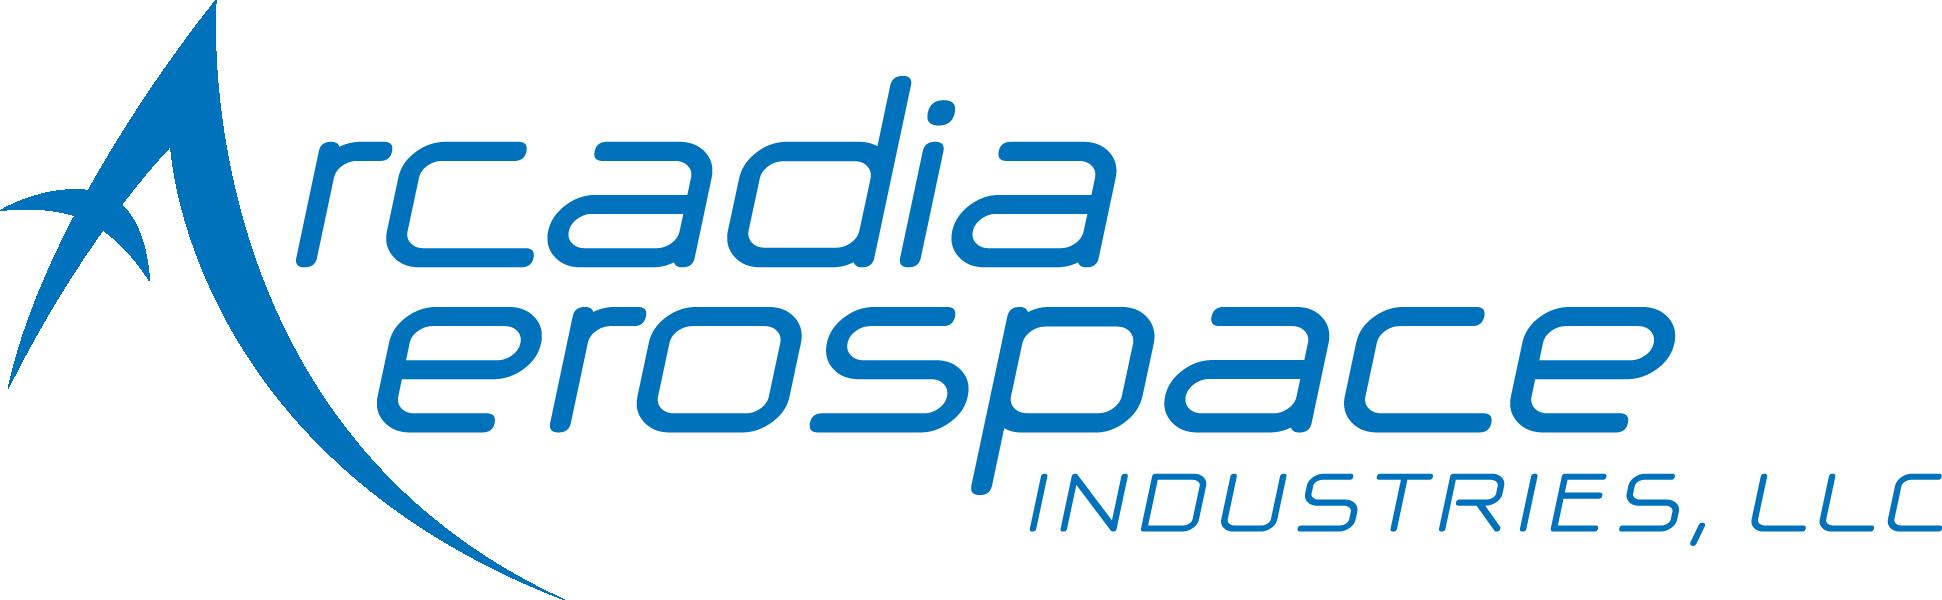 Arcadia Aerospace Industries, LLC logo.